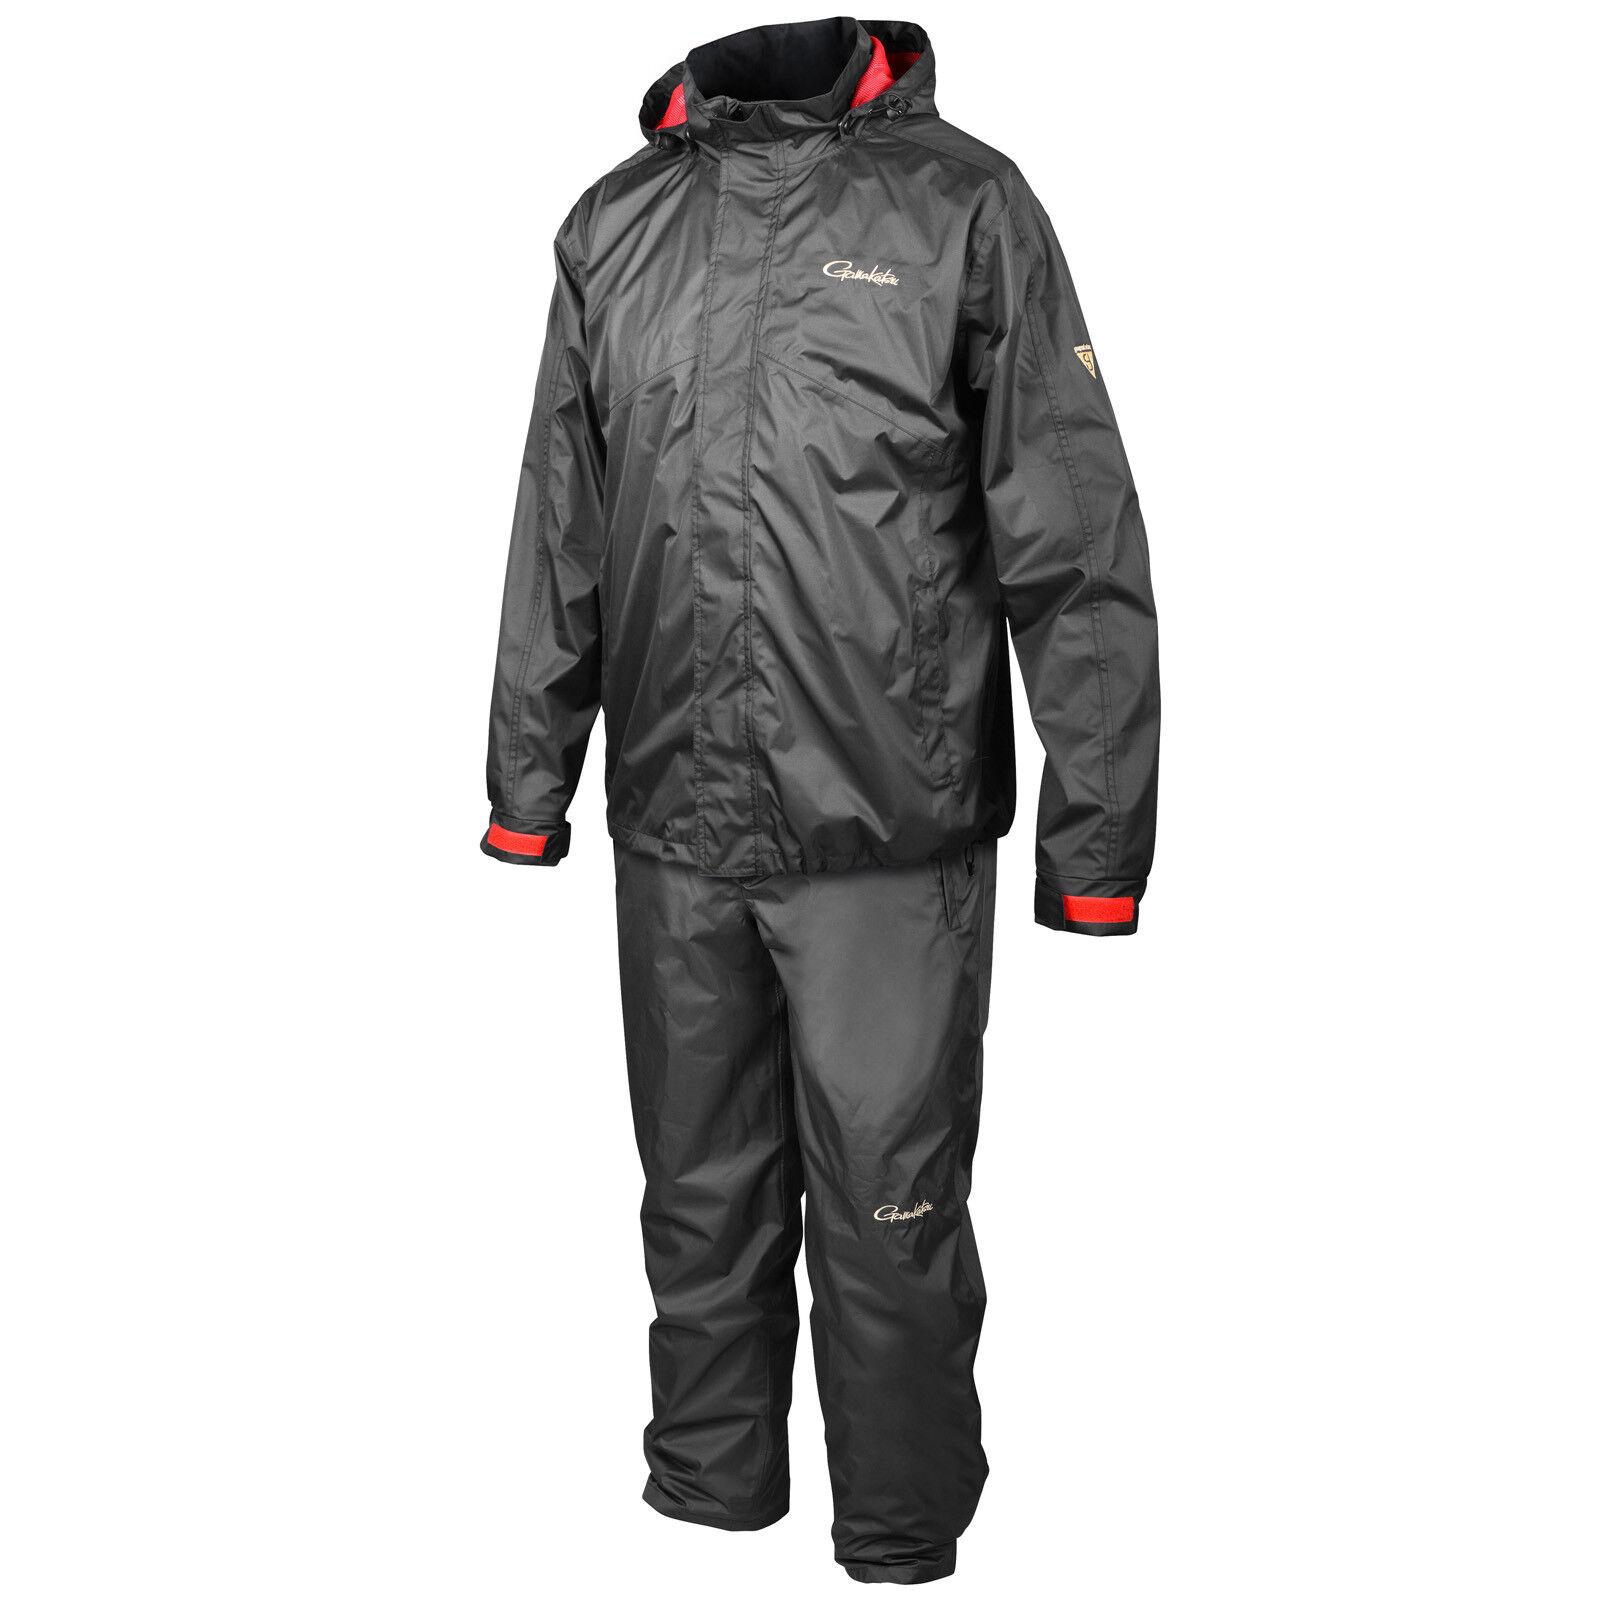 Dirigido Gamakatsu Ripstop lluvia traje lluvia traje chaqueta M-XXXL y pantalones transpirables